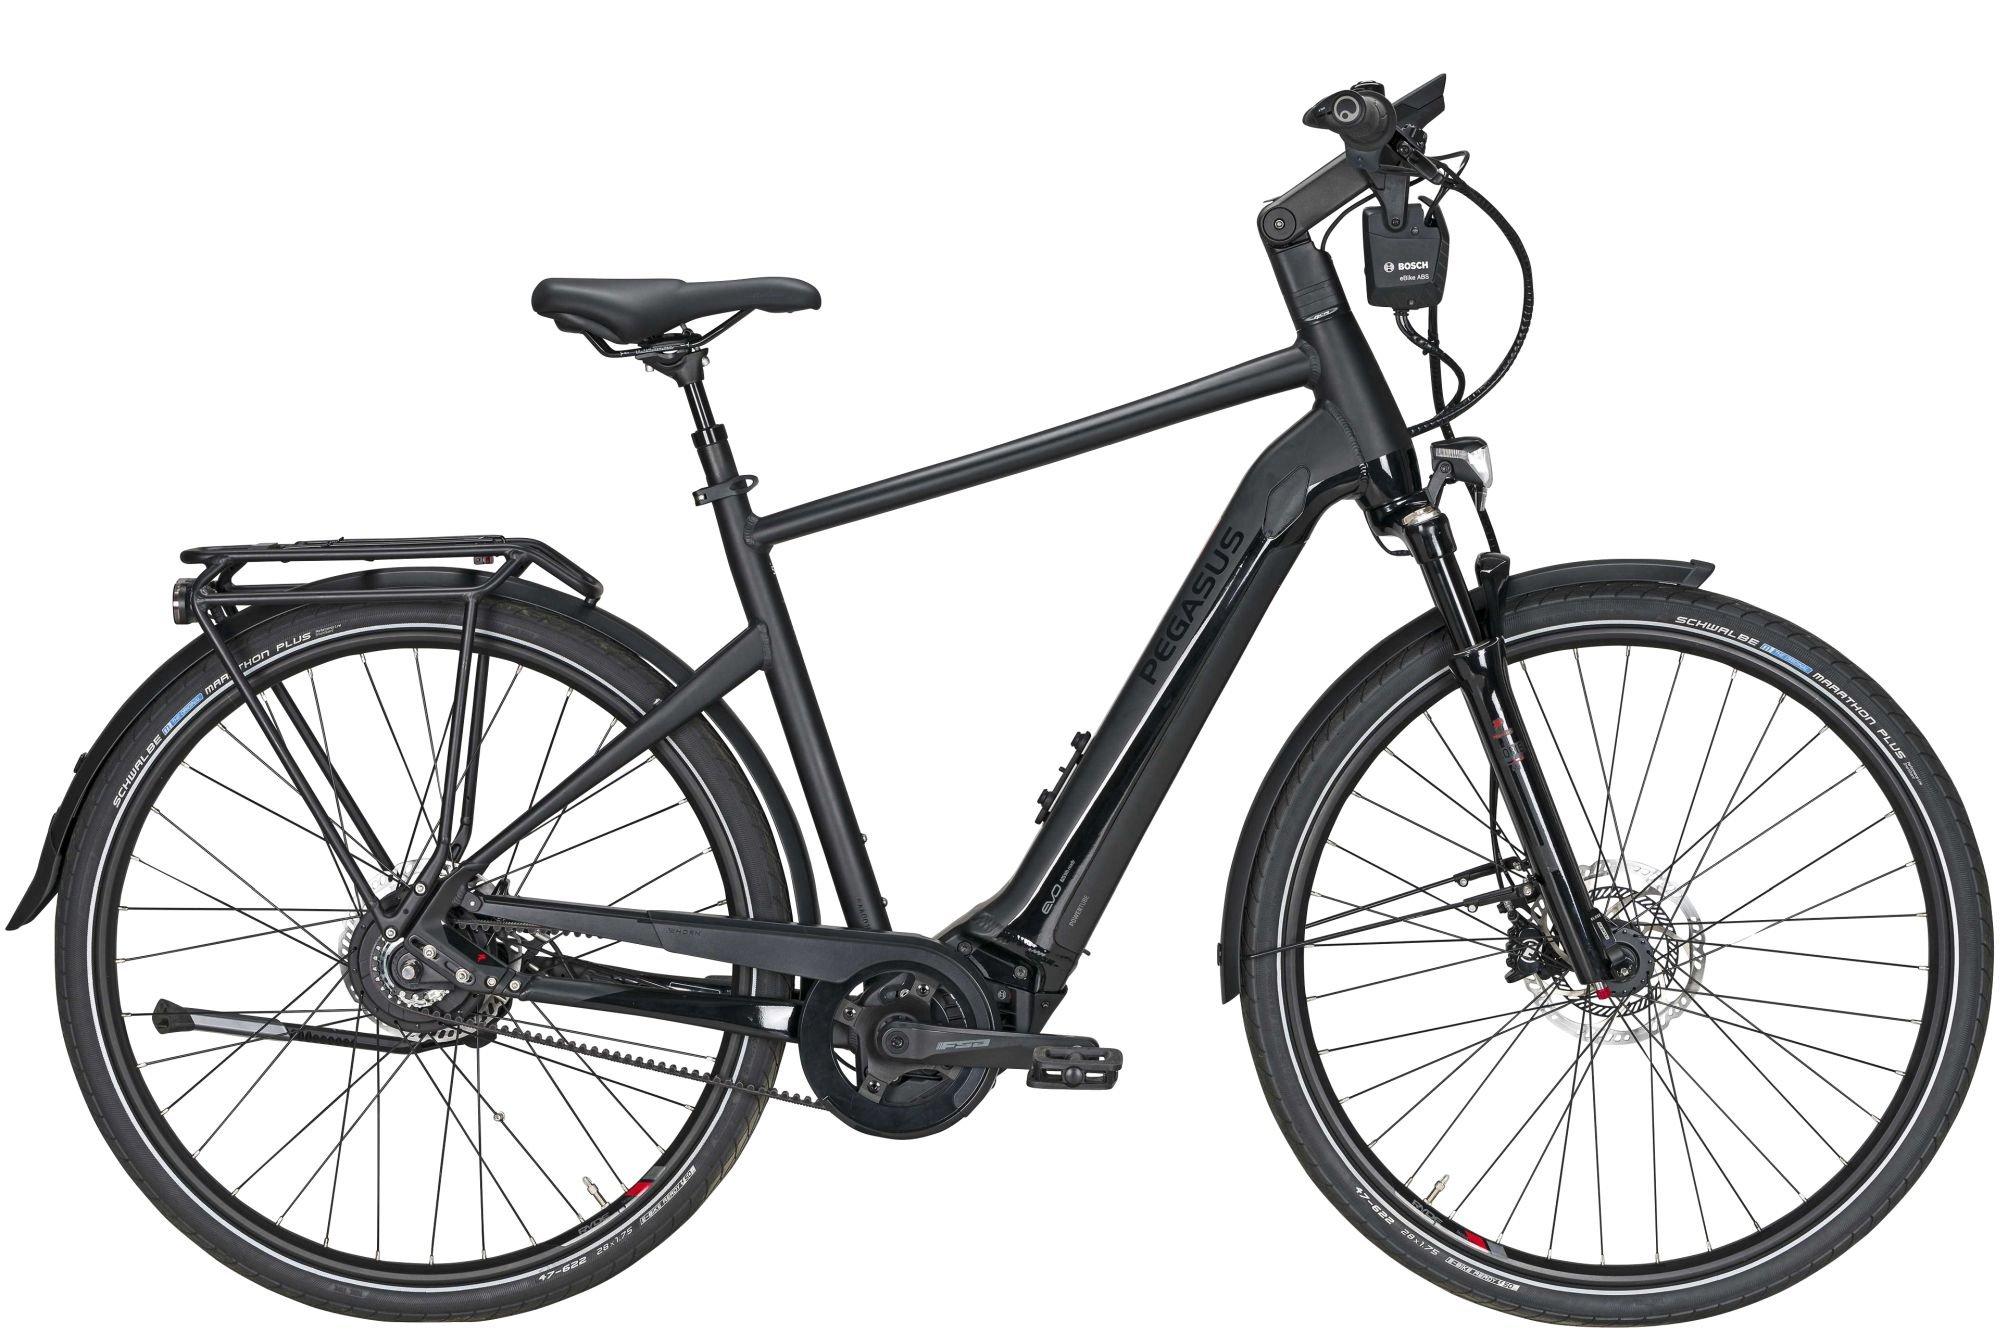 E-Bikes/Citybikes: Diamant  Premio Evo NV Lite Belt ABS (400 Wh) stufenlose Nabenschaltung Herrenfahrrad Diamant Modell 2021 28 Zoll 45 cm blac